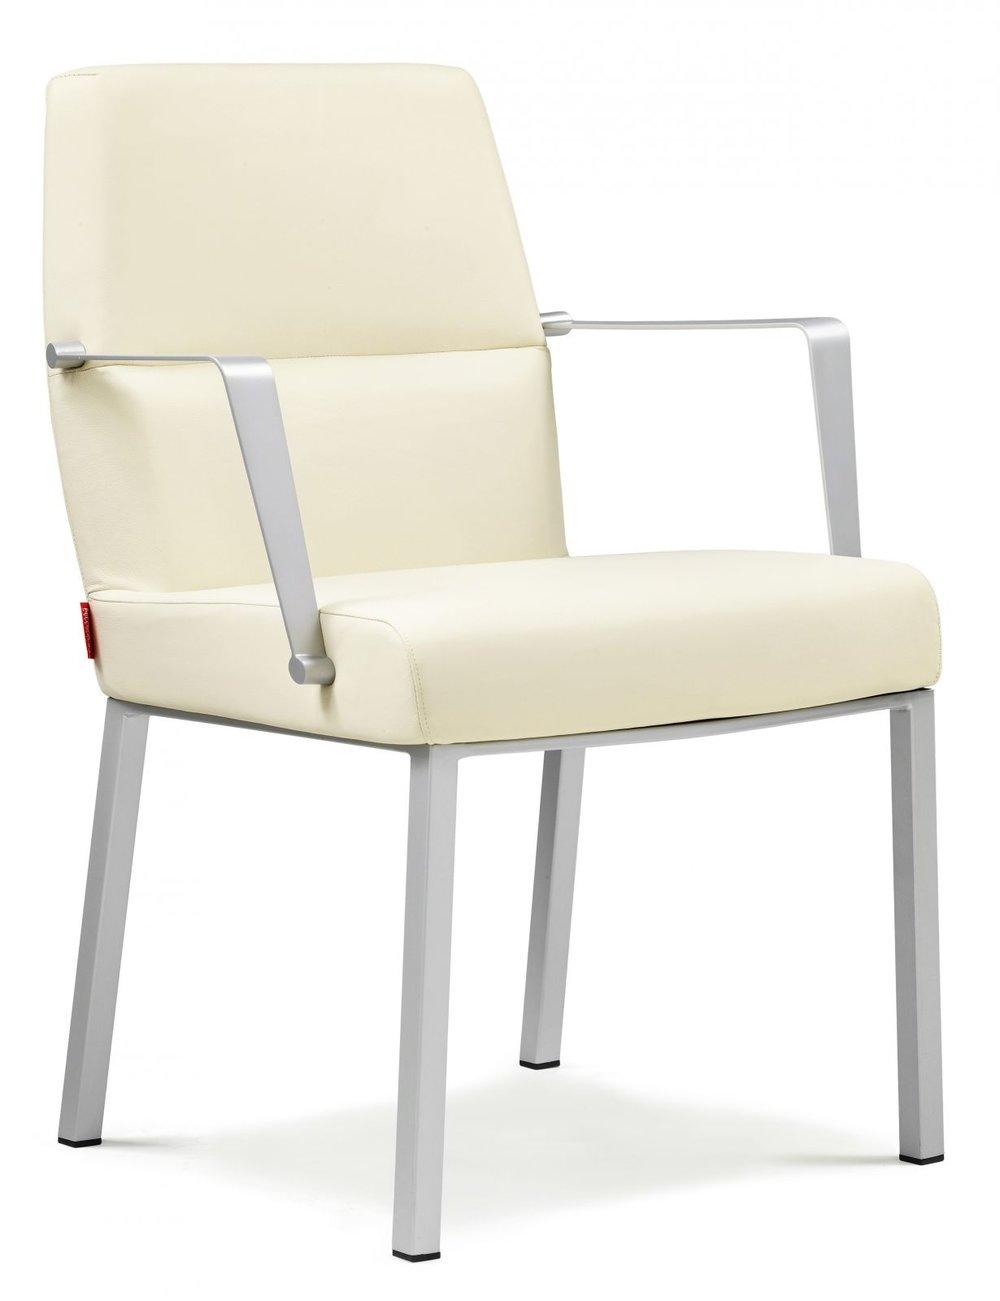 modern-office-armchairs-Italian-furniture-designer-armchairs (45).jpg